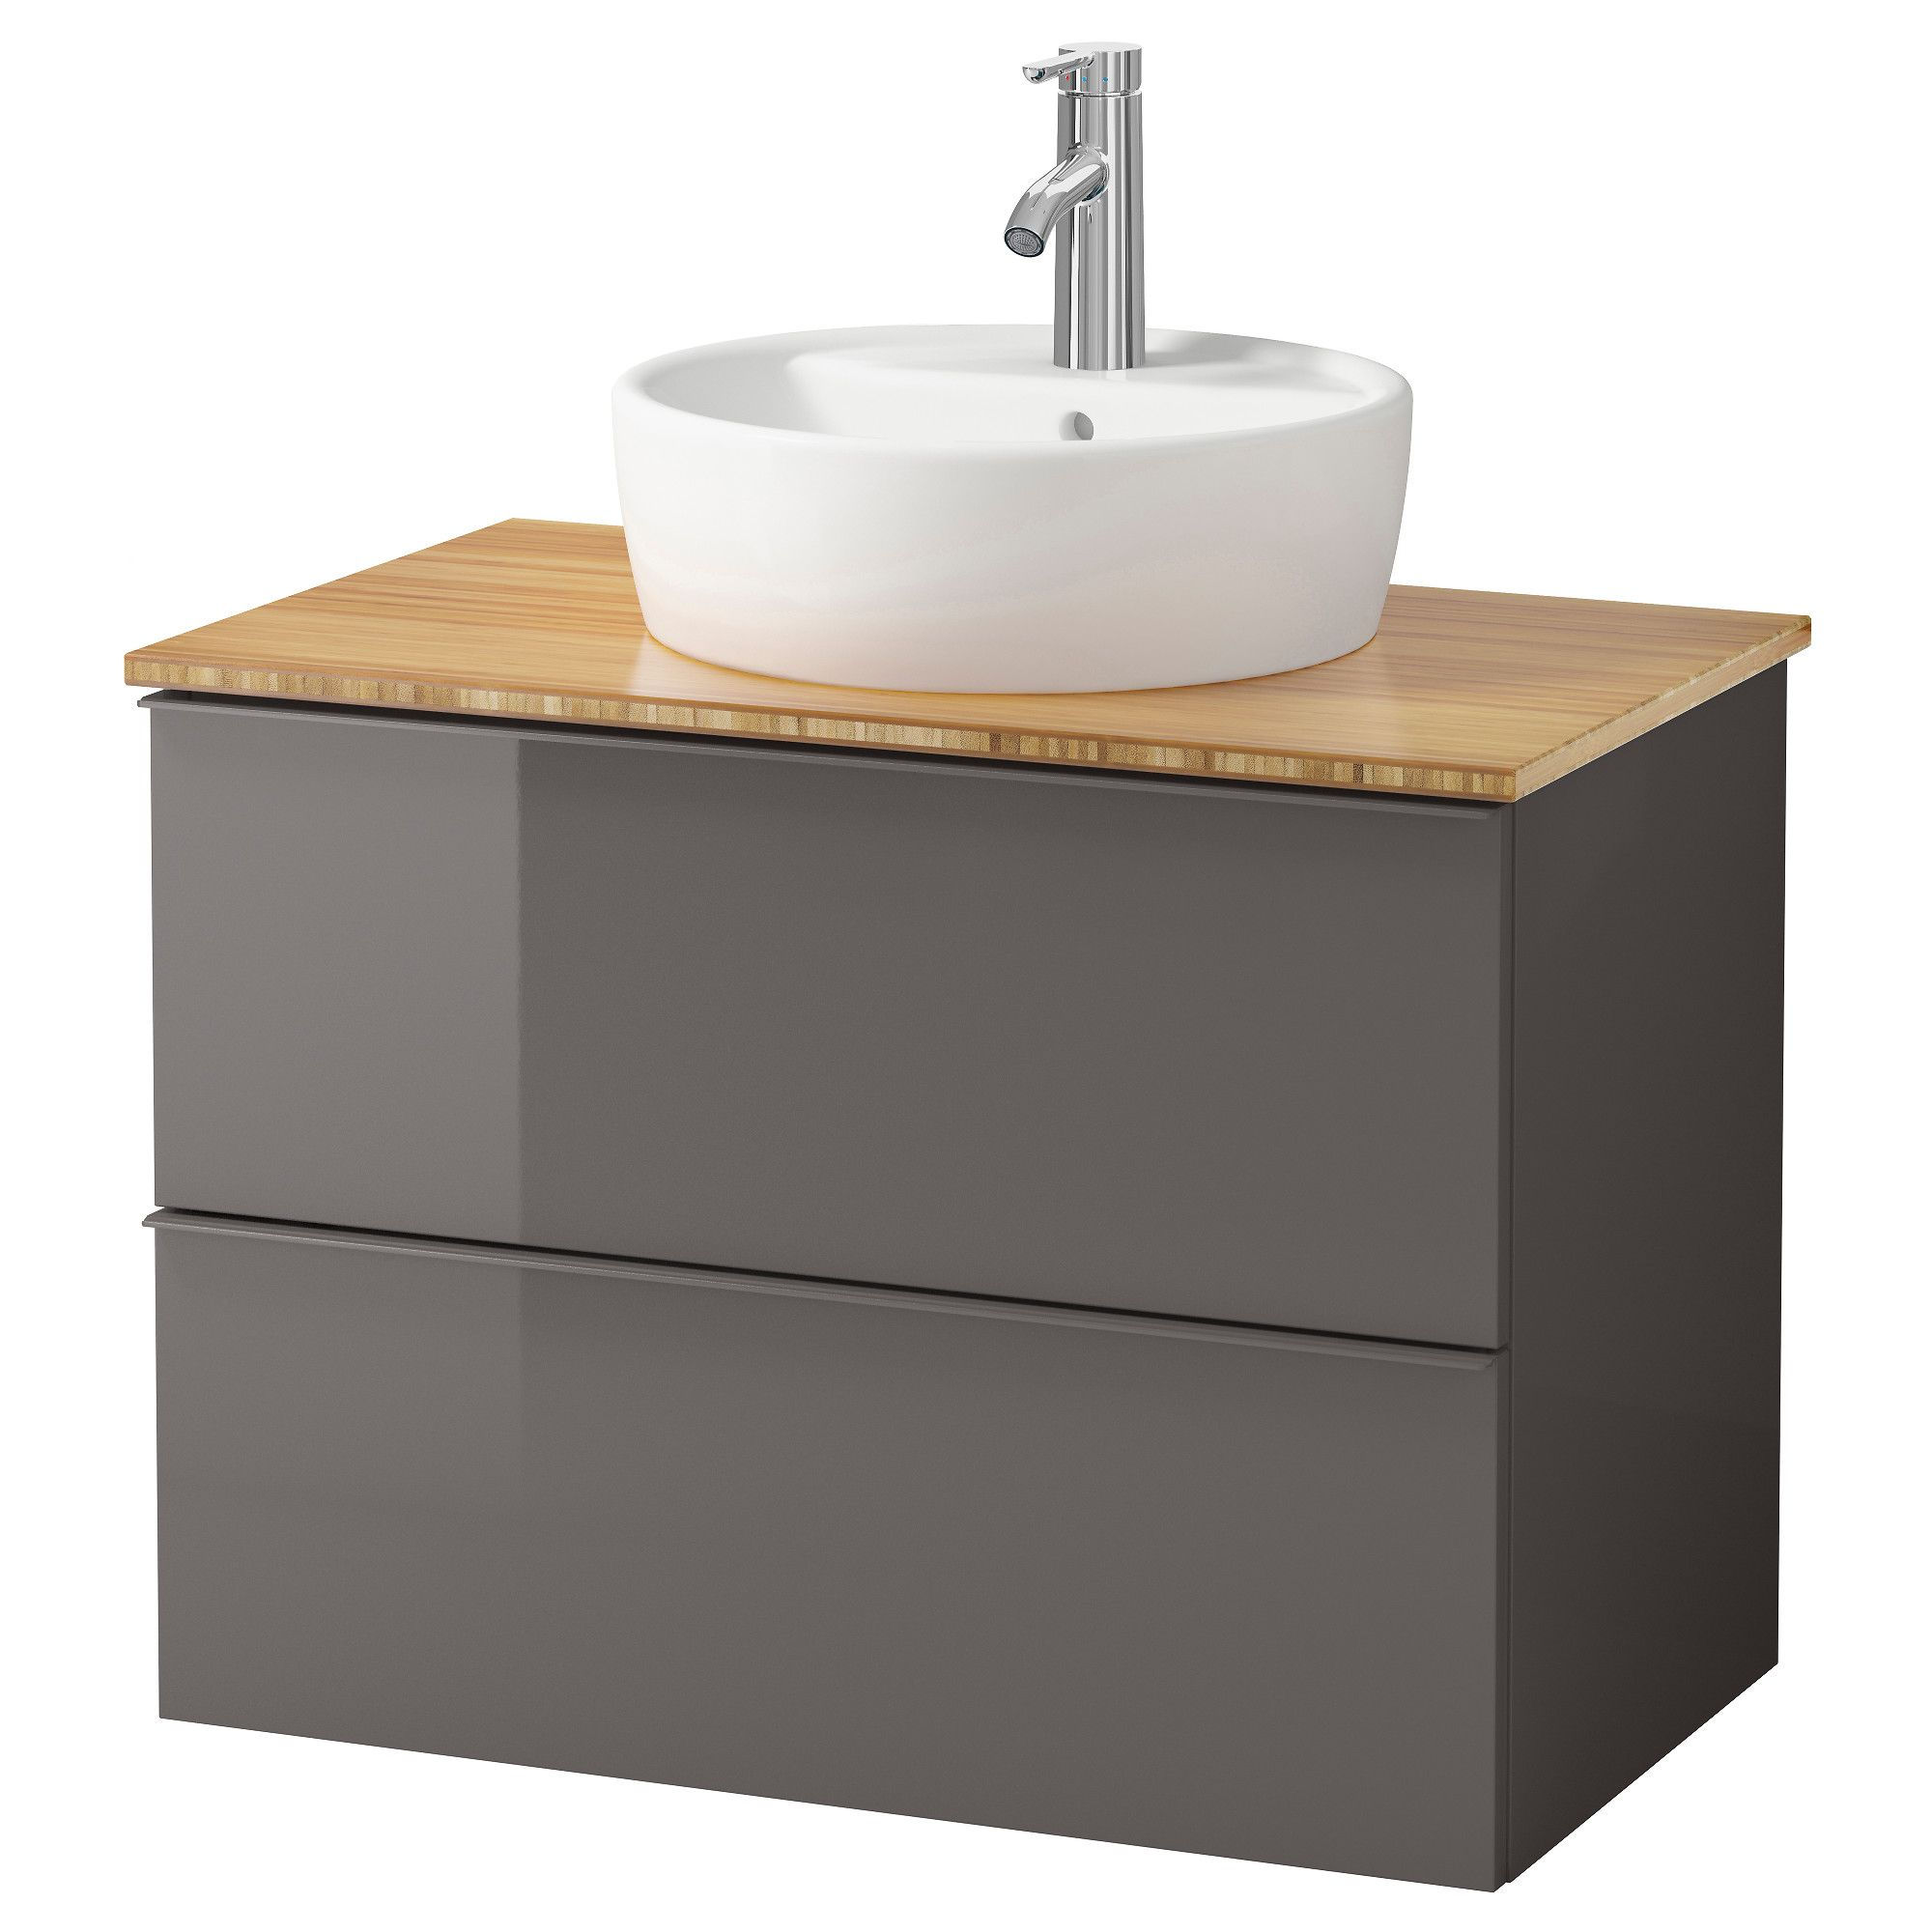 Moderne Badezimmer Mobel Badezimmer Mobel Moderne Waschbecken Badezimmer